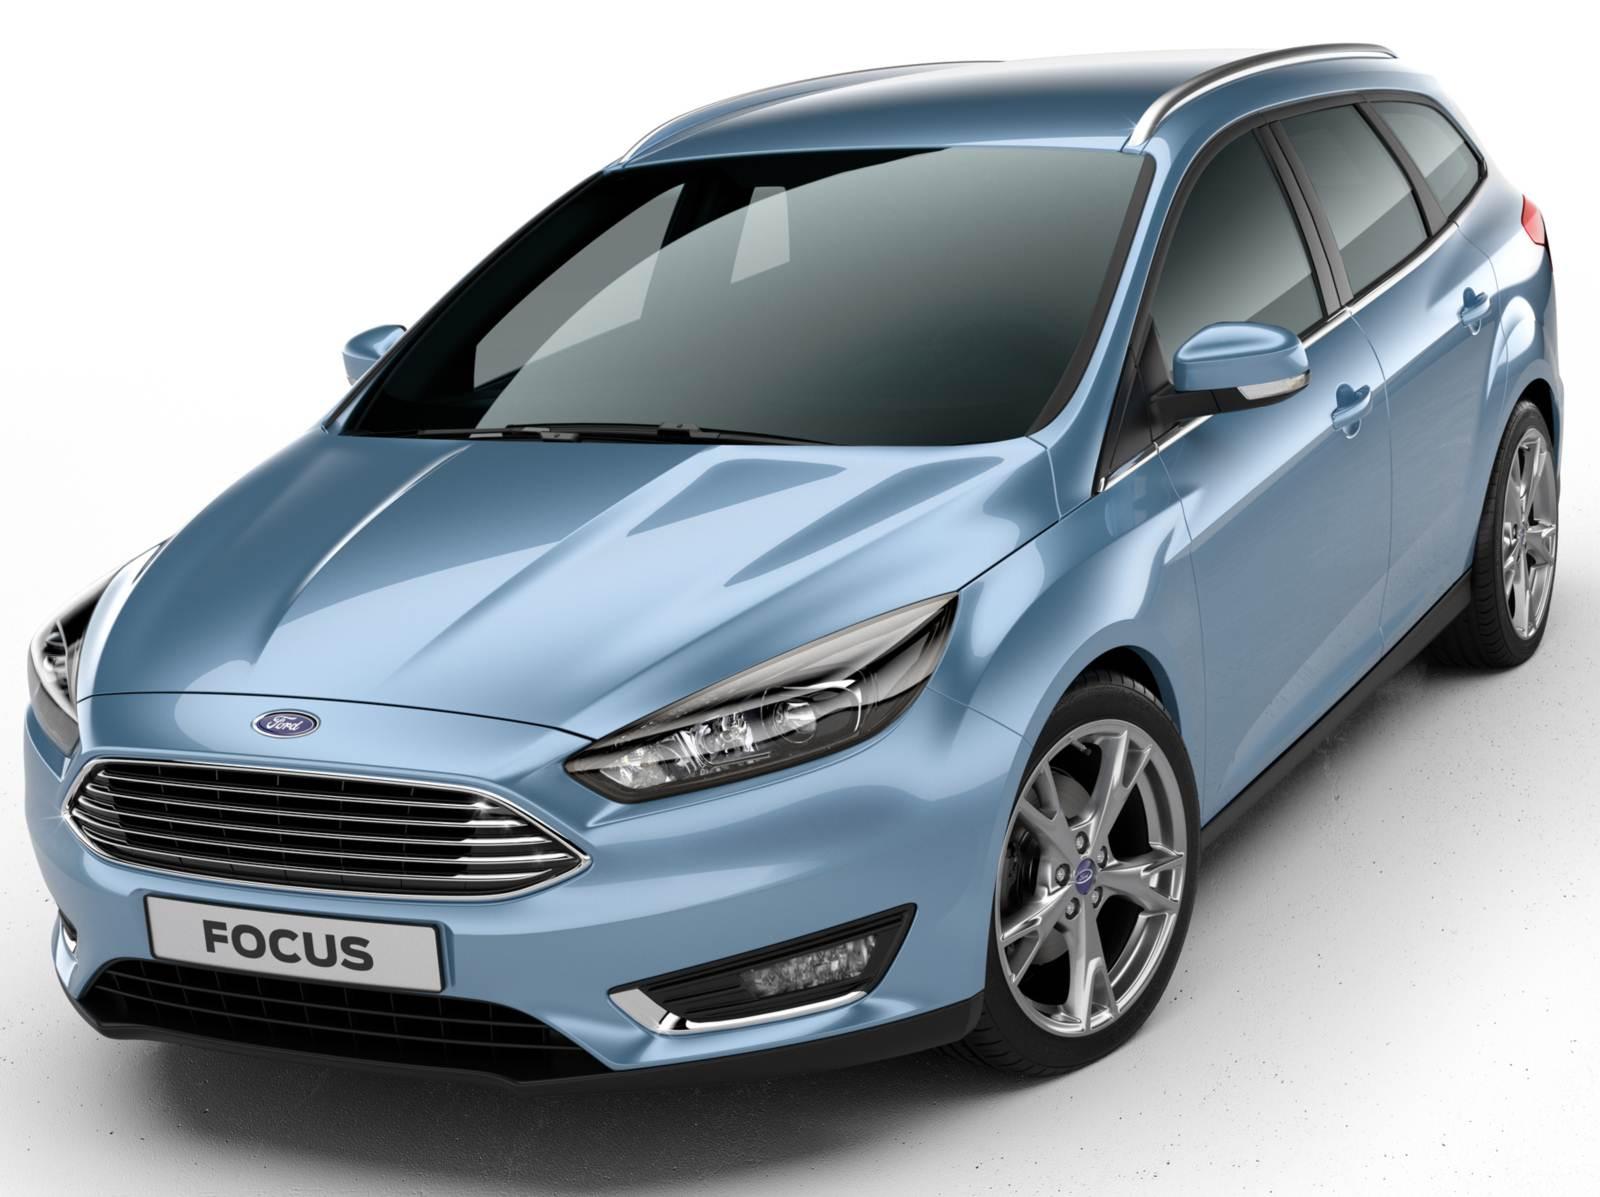 Novo Ford Focus 2015 Station Wagon